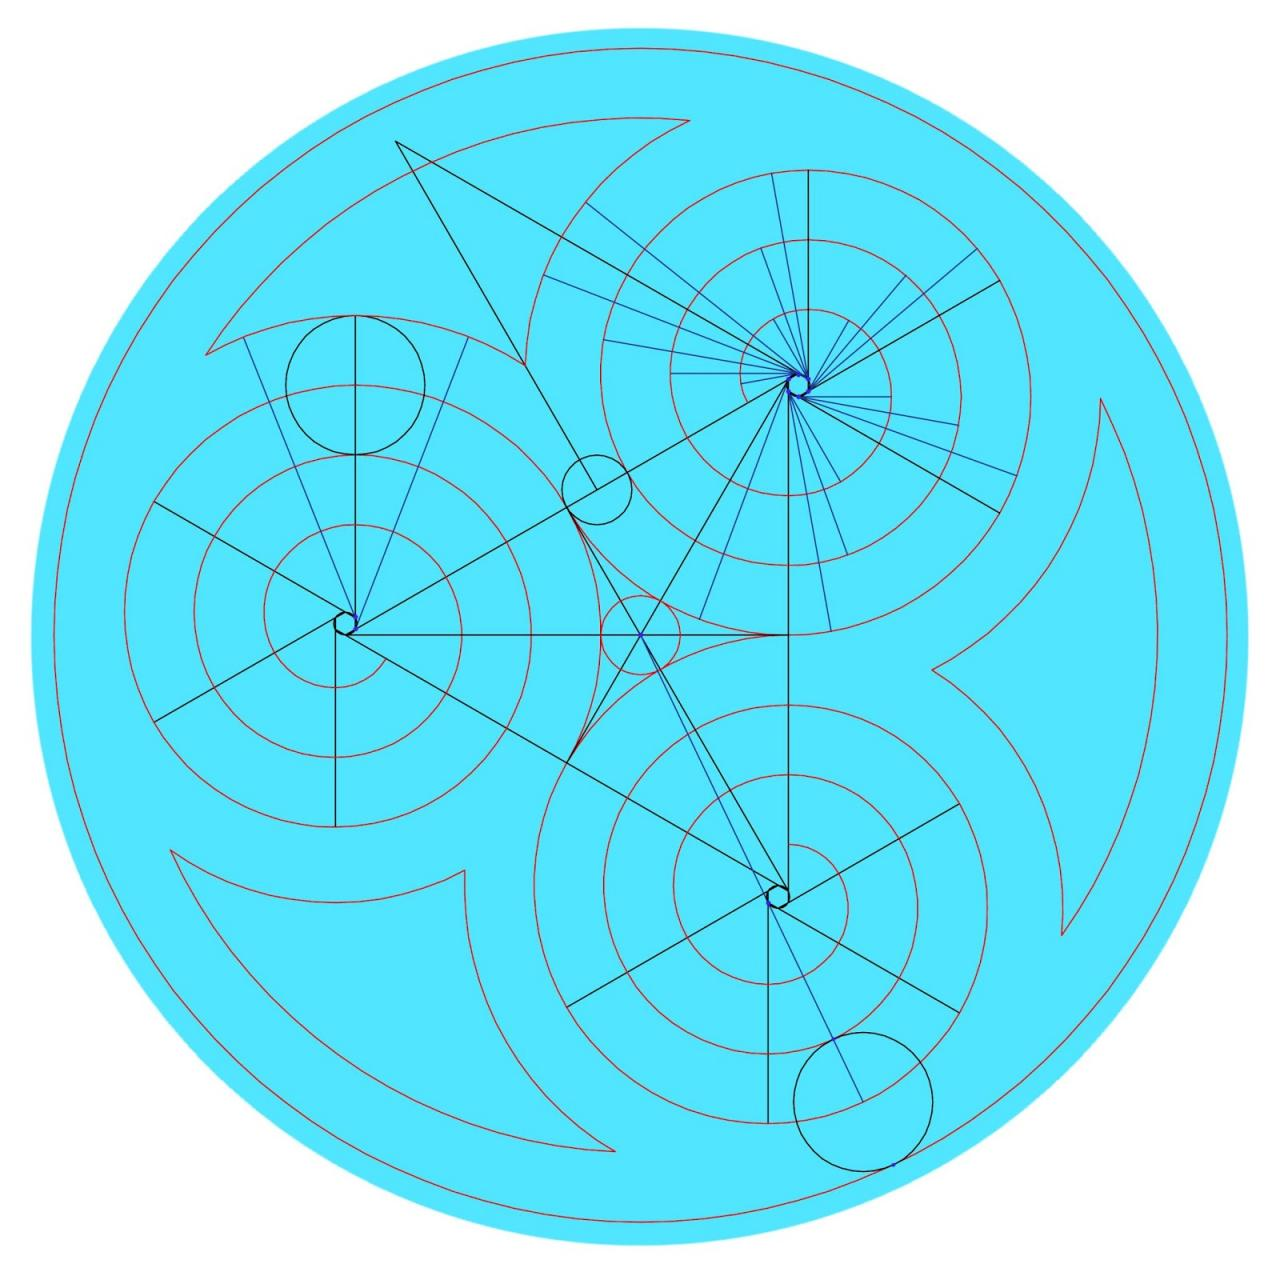 Arabesko: Método para dibujar un trisquel utilizando compás  espiral  Arquímedes -  Method to draw a trisquel  Archimedean spiral  using the  compass -, dibujos de Un Trisquel, como dibujar Un Trisquel paso a paso